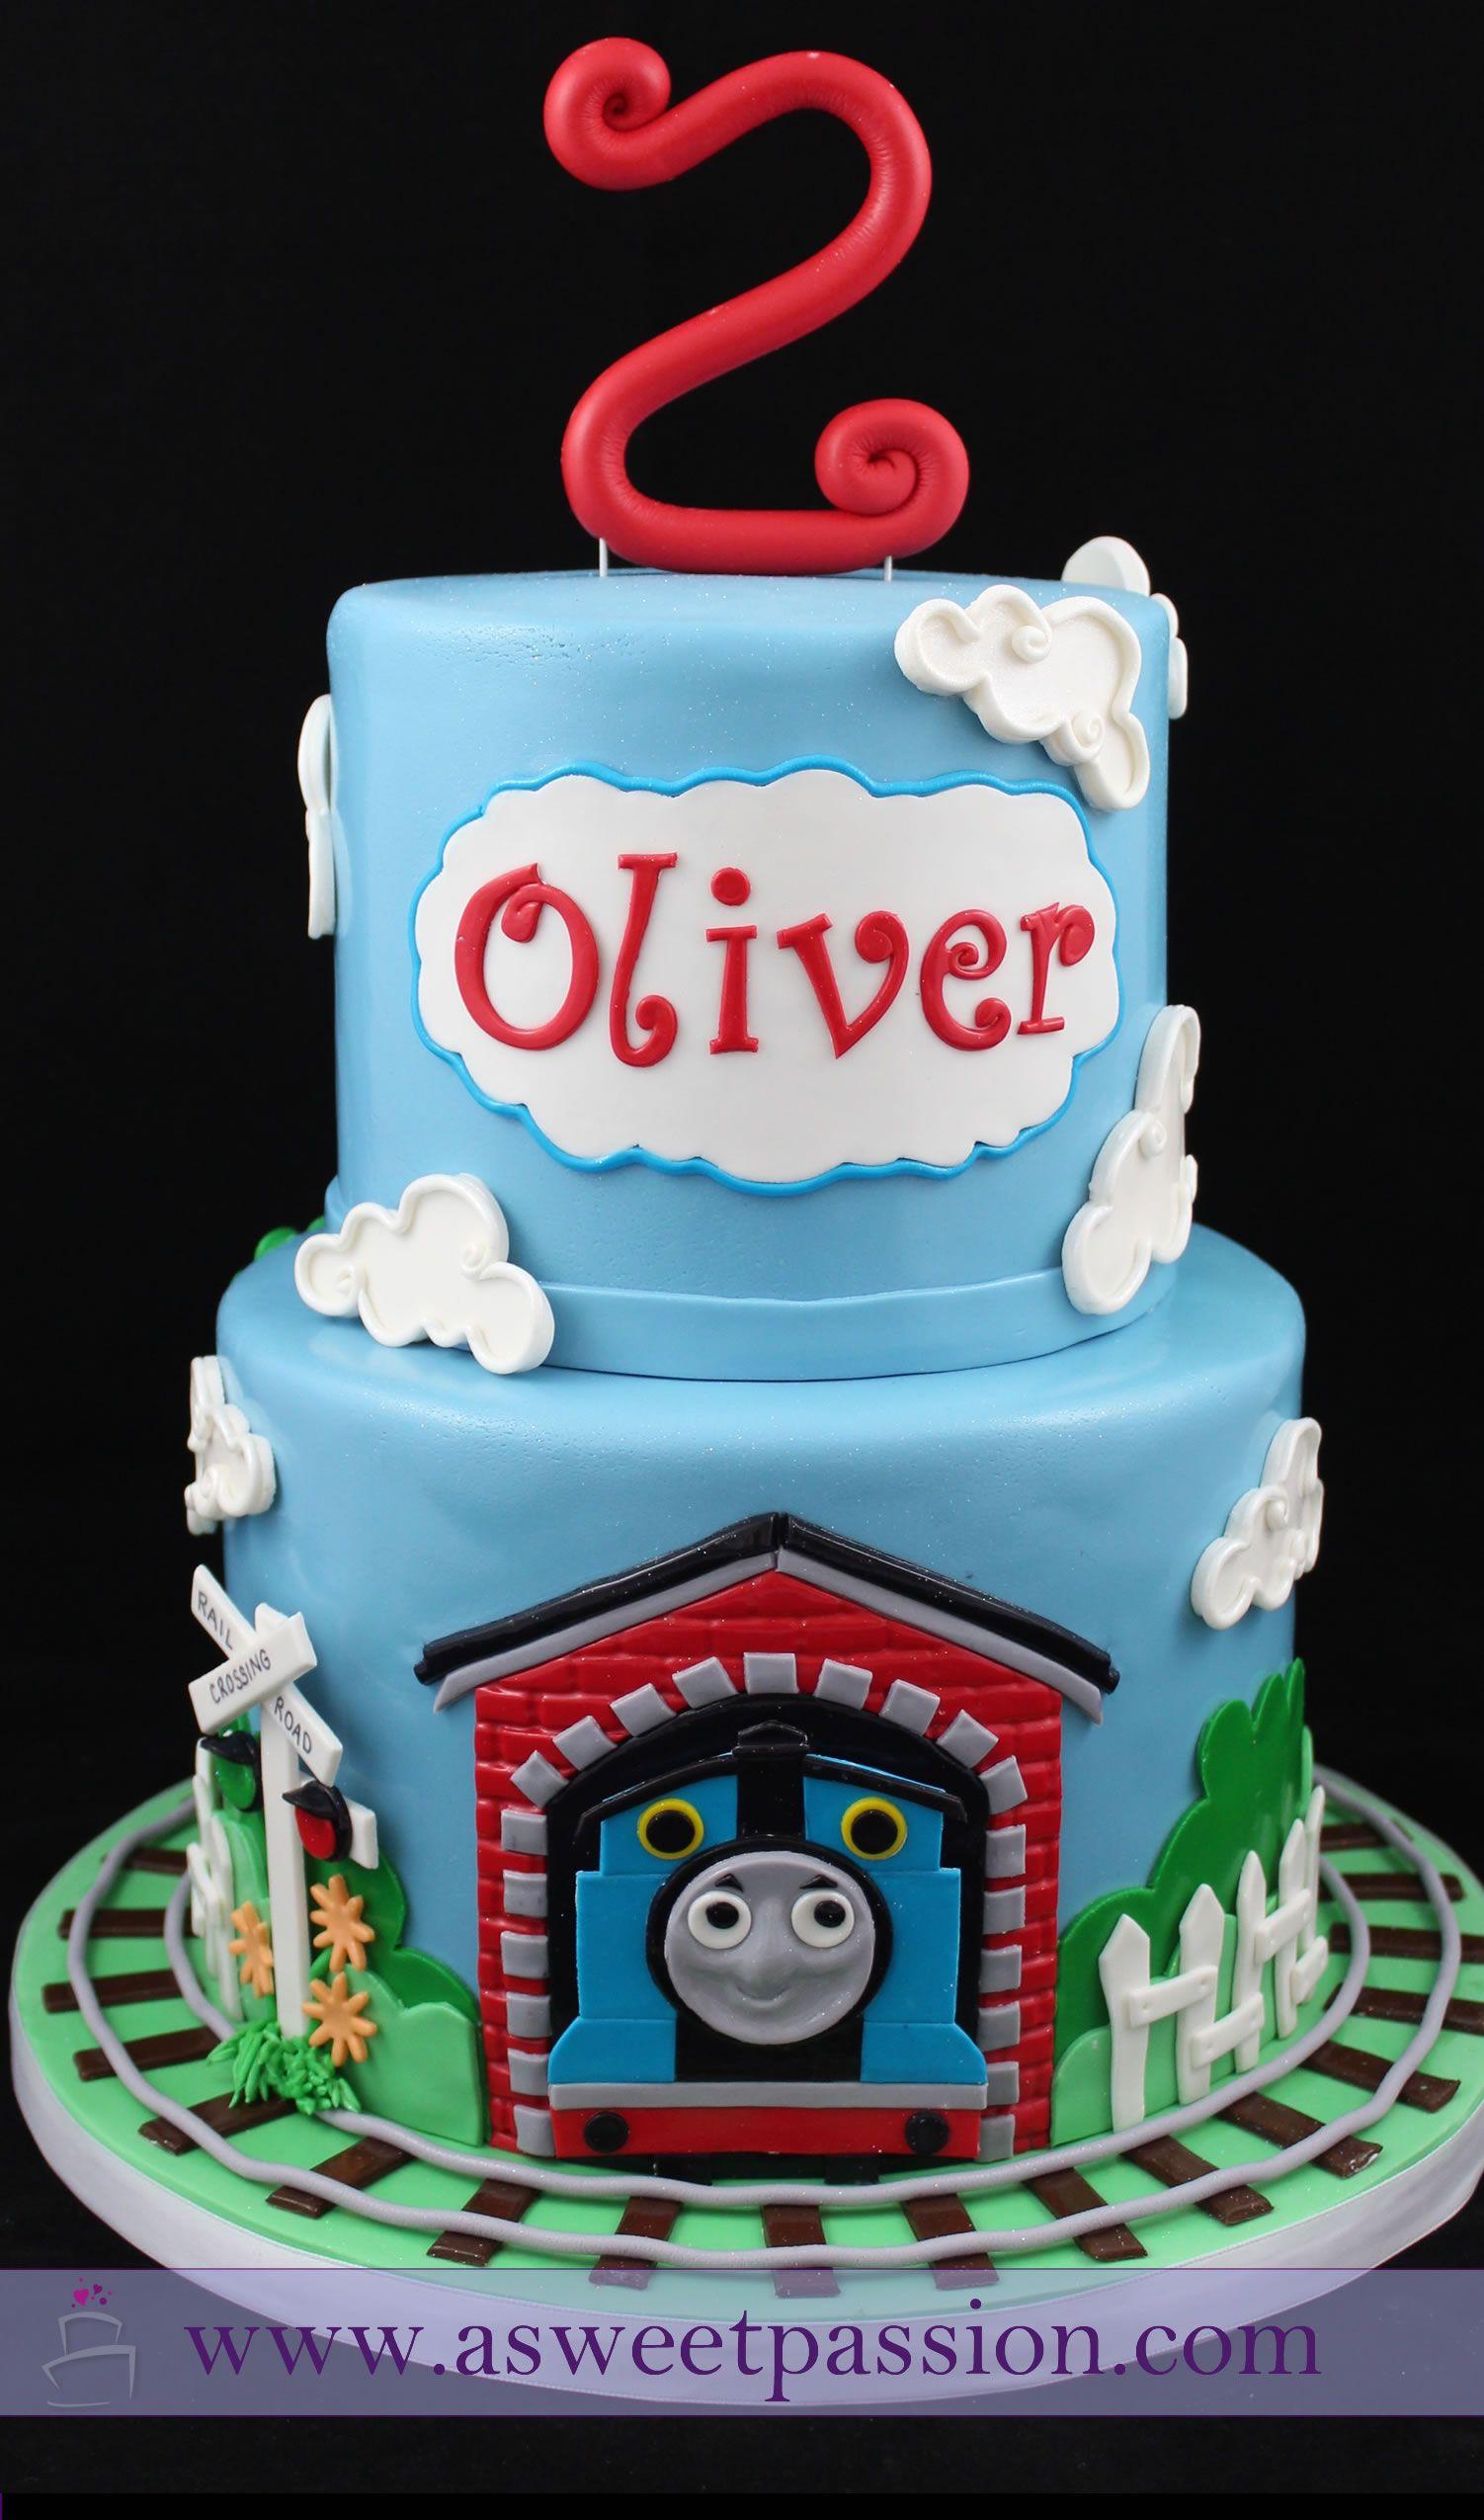 2 Year Old Birthday Cake : birthday, Thomas, Engine, Birthday, Sweet, 2-year, Cakes,, First, Train